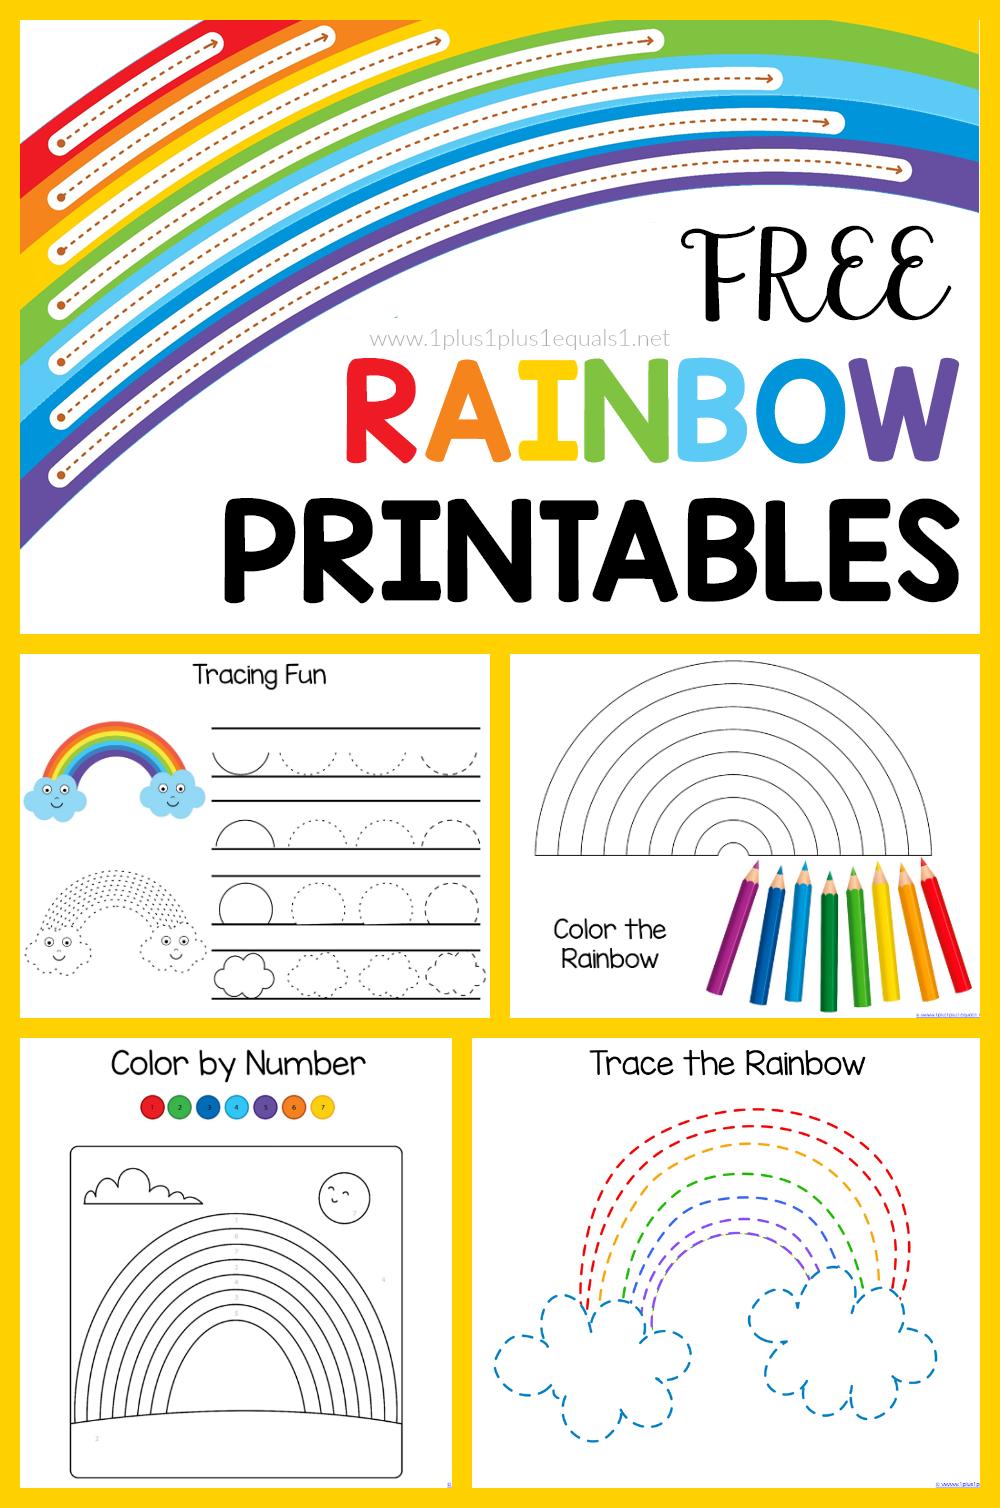 Fun With Rainbows Mini Printable Pack 1 1 1 1 Rainbow Activities Free Preschool Printables Printables Free Kids [ 1508 x 1000 Pixel ]